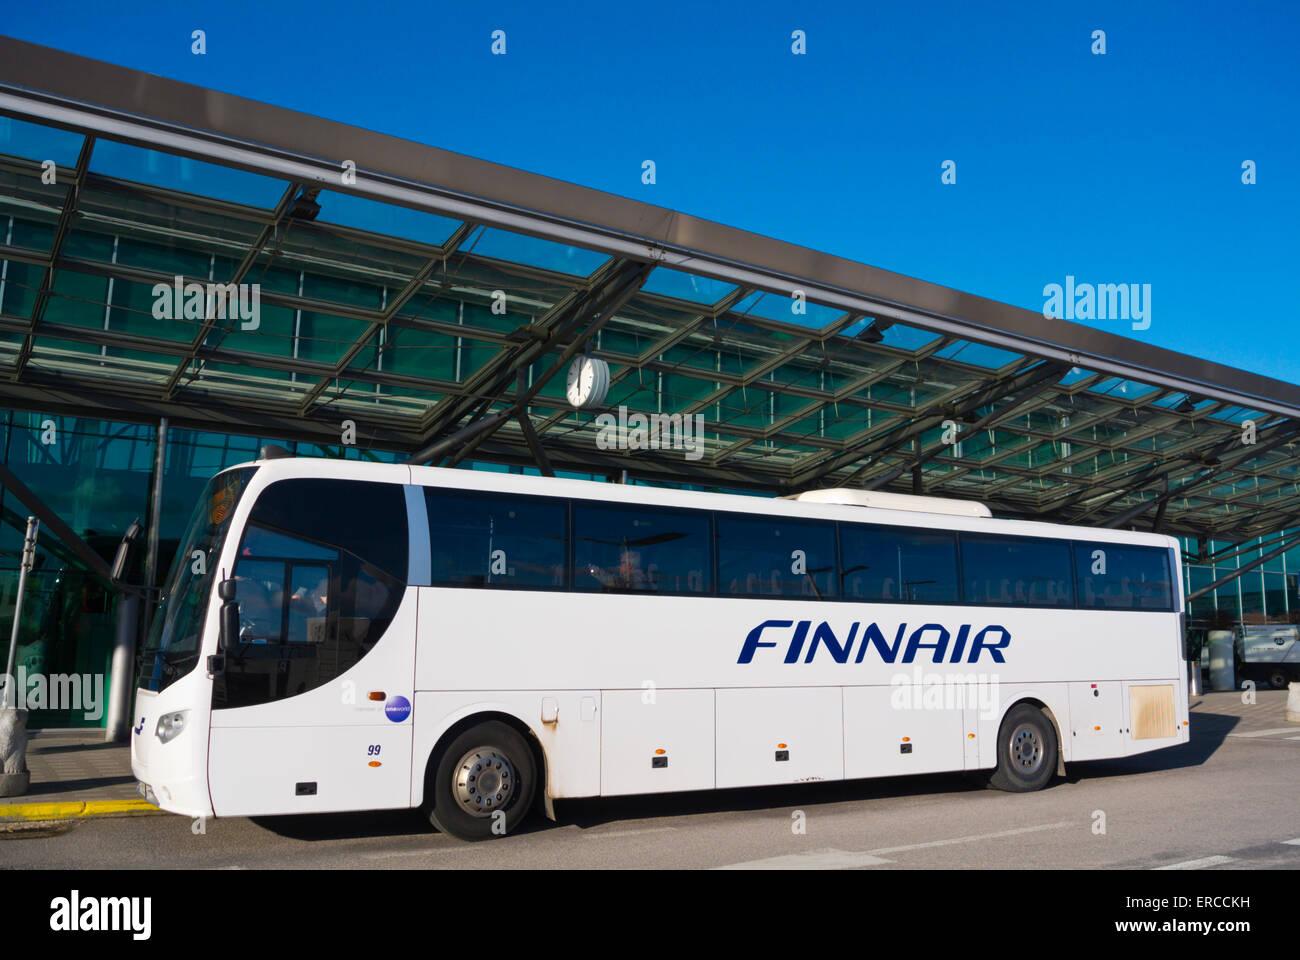 Helsinki Airport Bus Stockfotos & Helsinki Airport Bus Bilder - Alamy